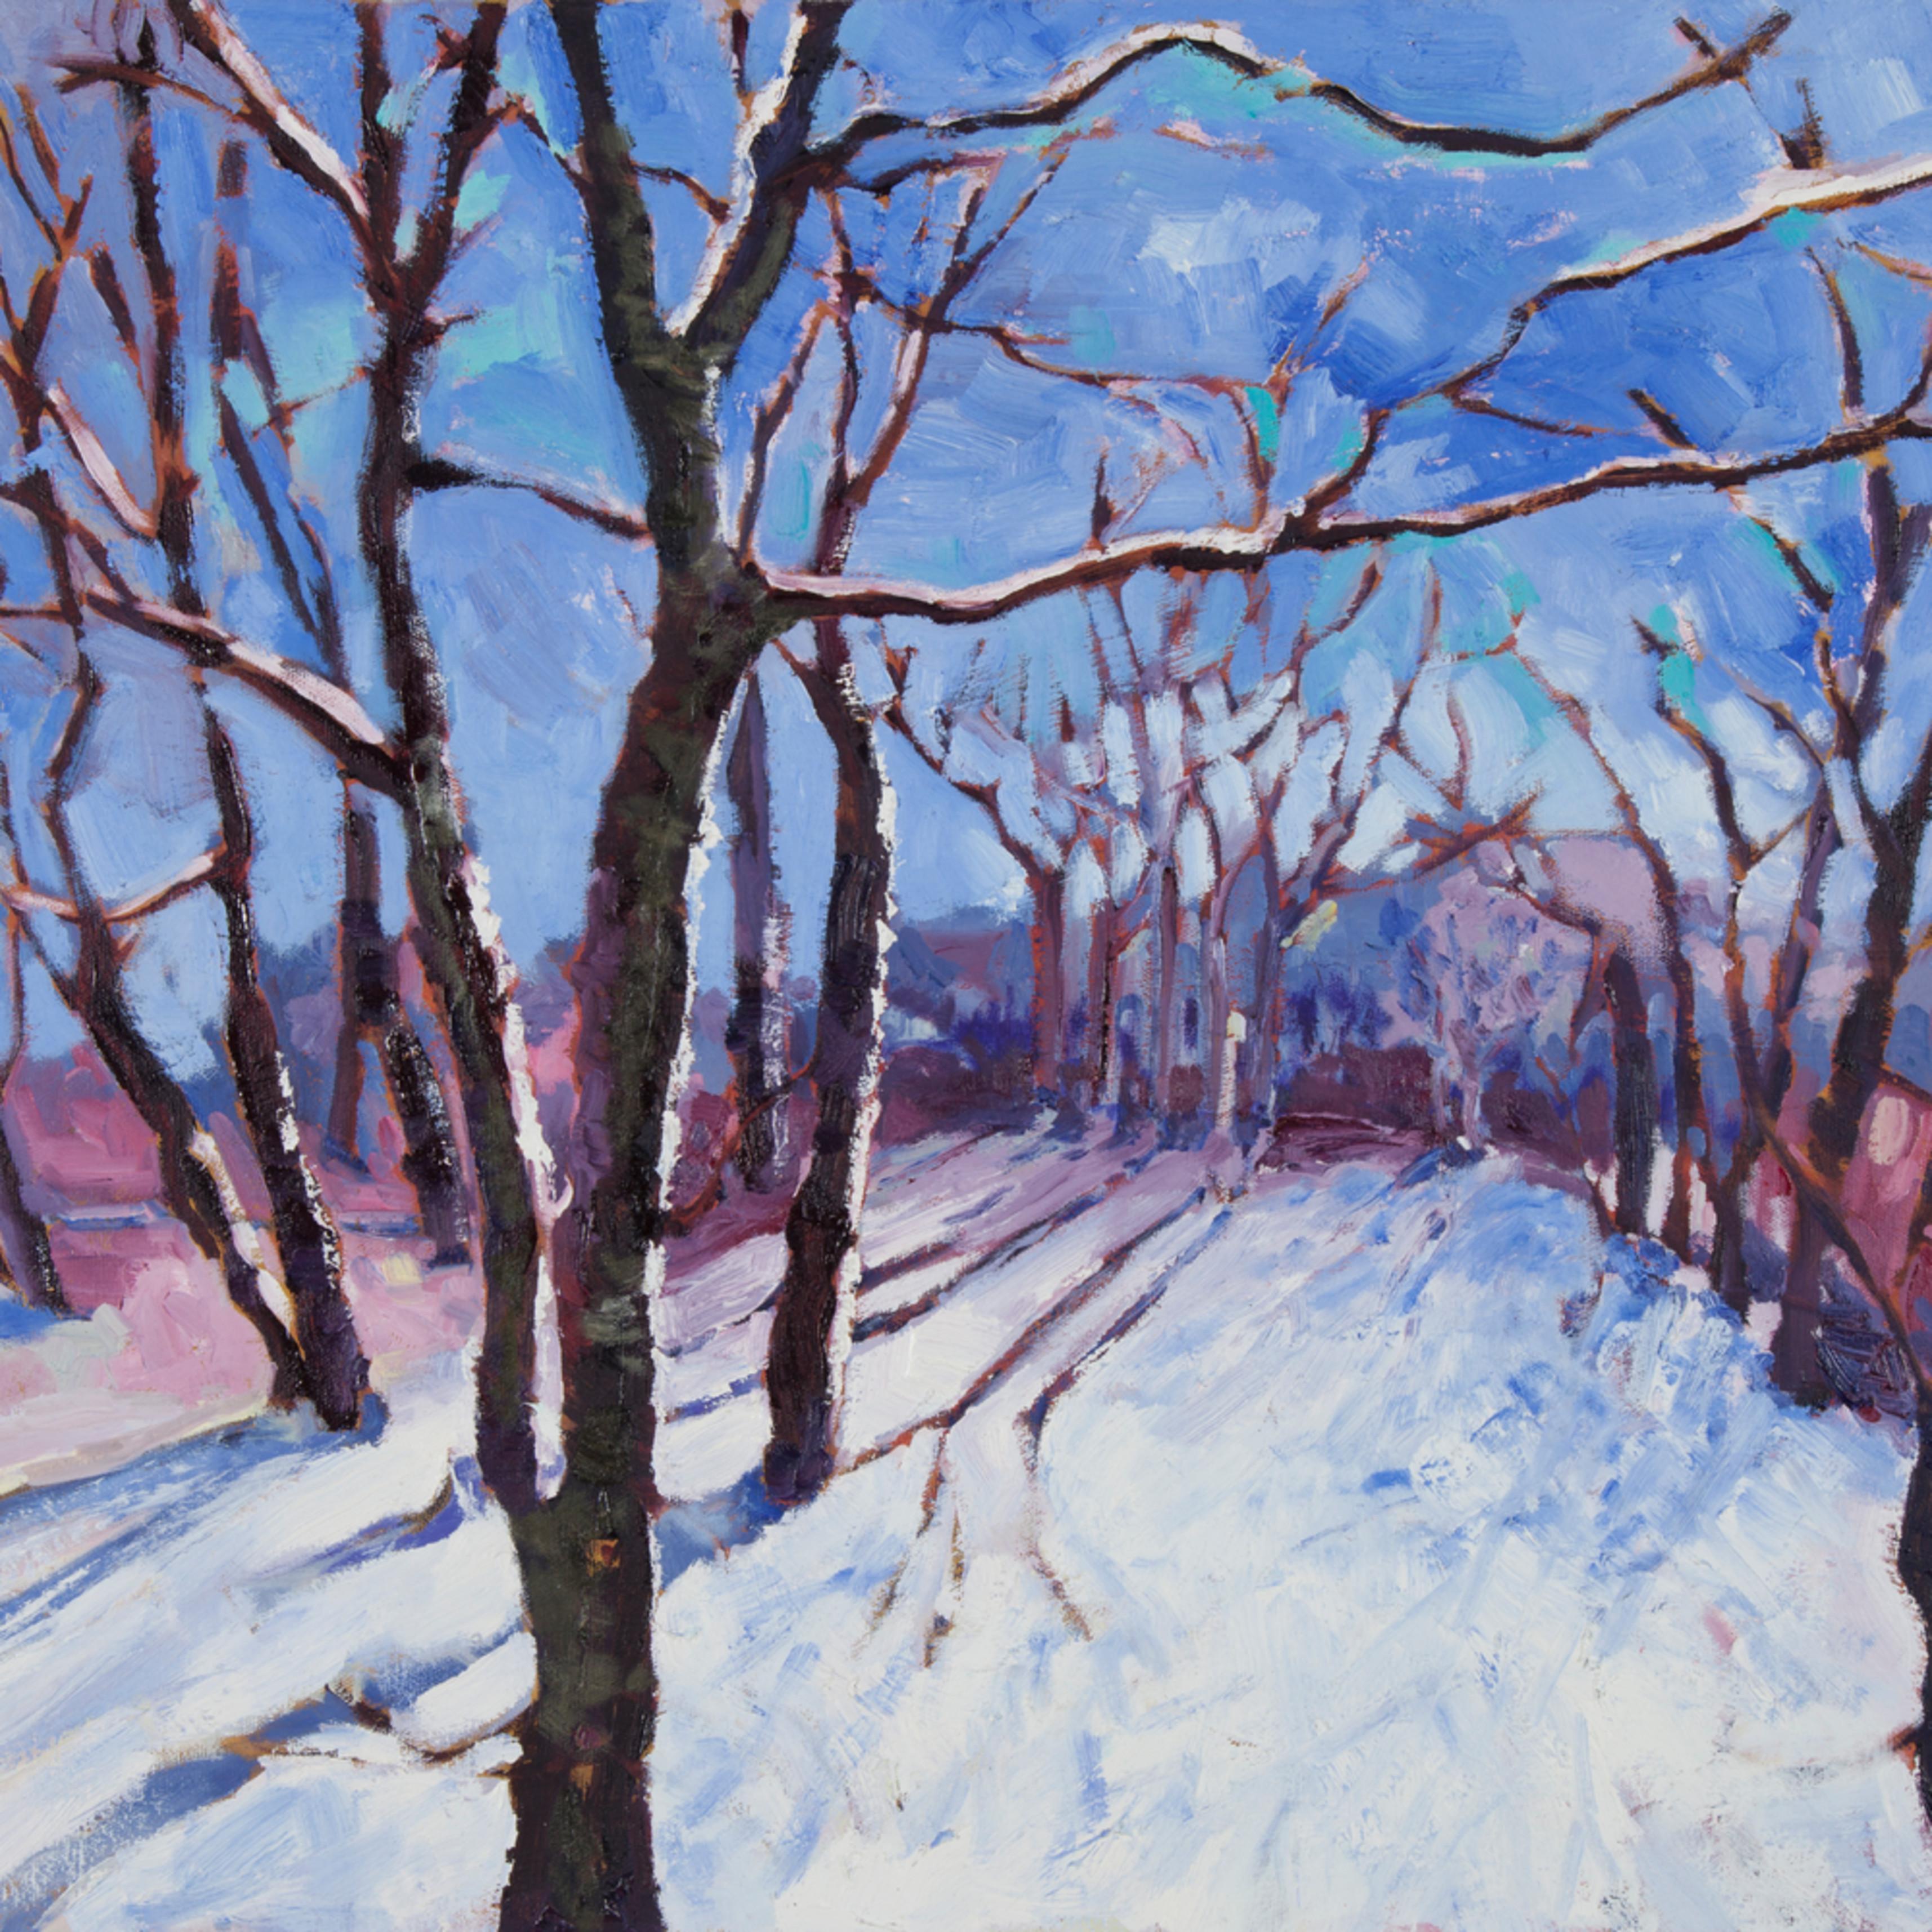 Winter stroll ys9oot